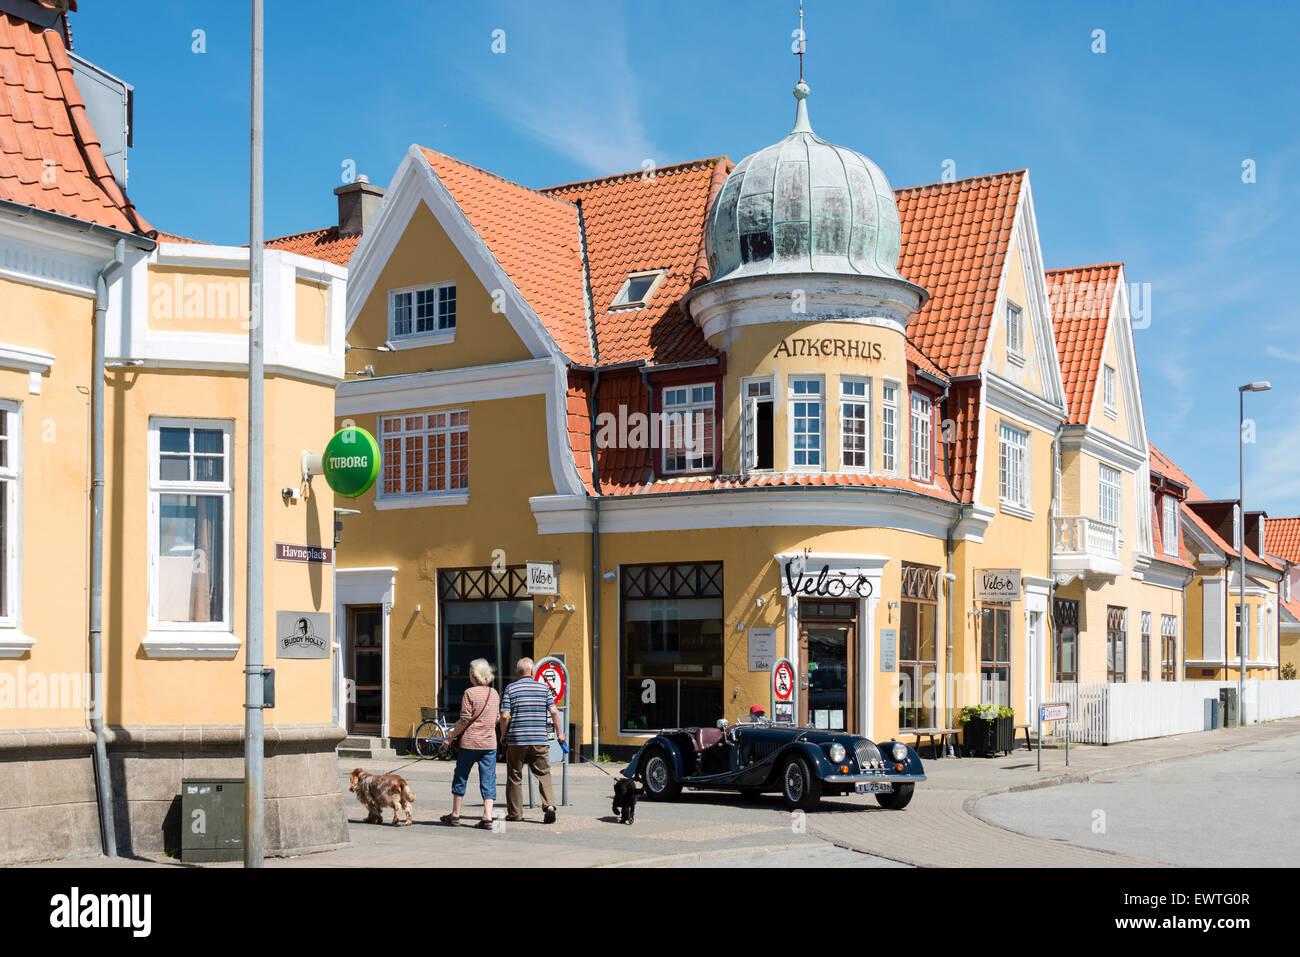 Ankerhus, Havneplads, Skagen, North Jutland Region, Denmark - Stock Image